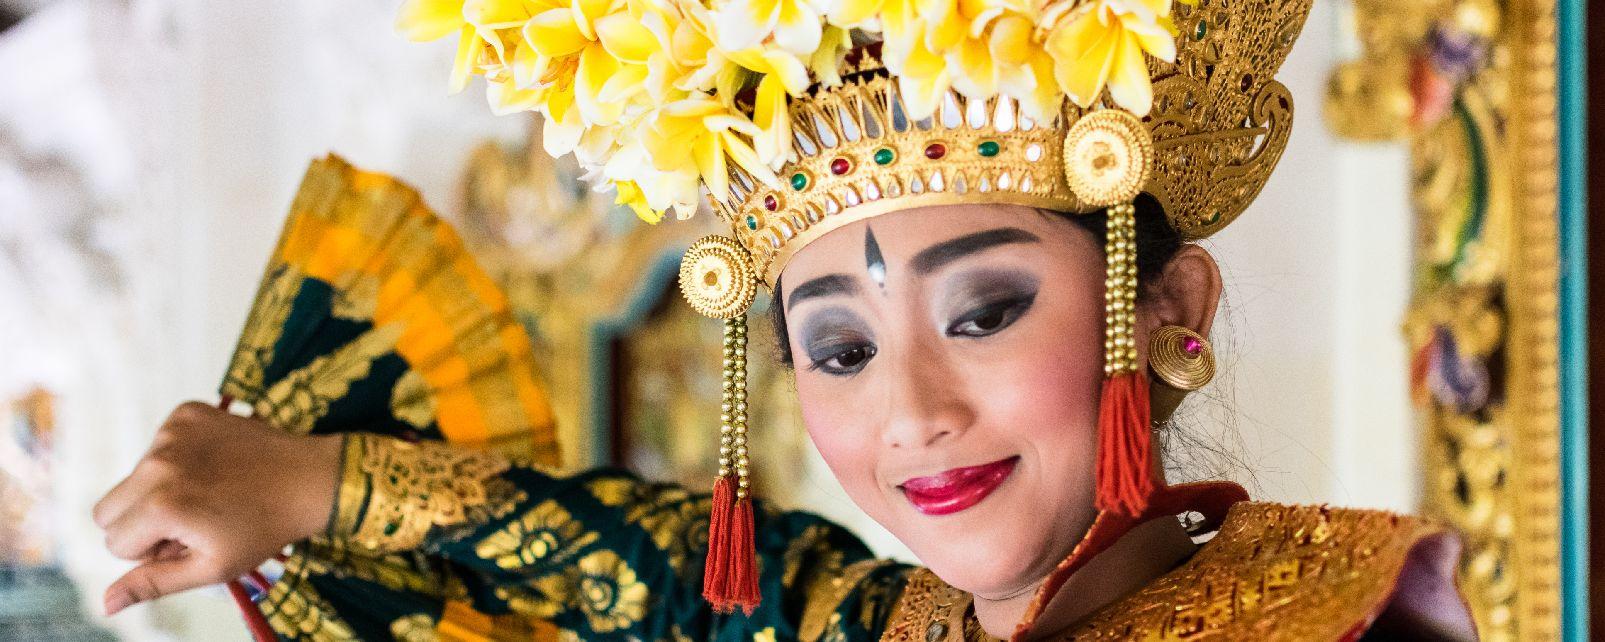 Asie, Indonésie, Bali, danse, danseuse, tradition,